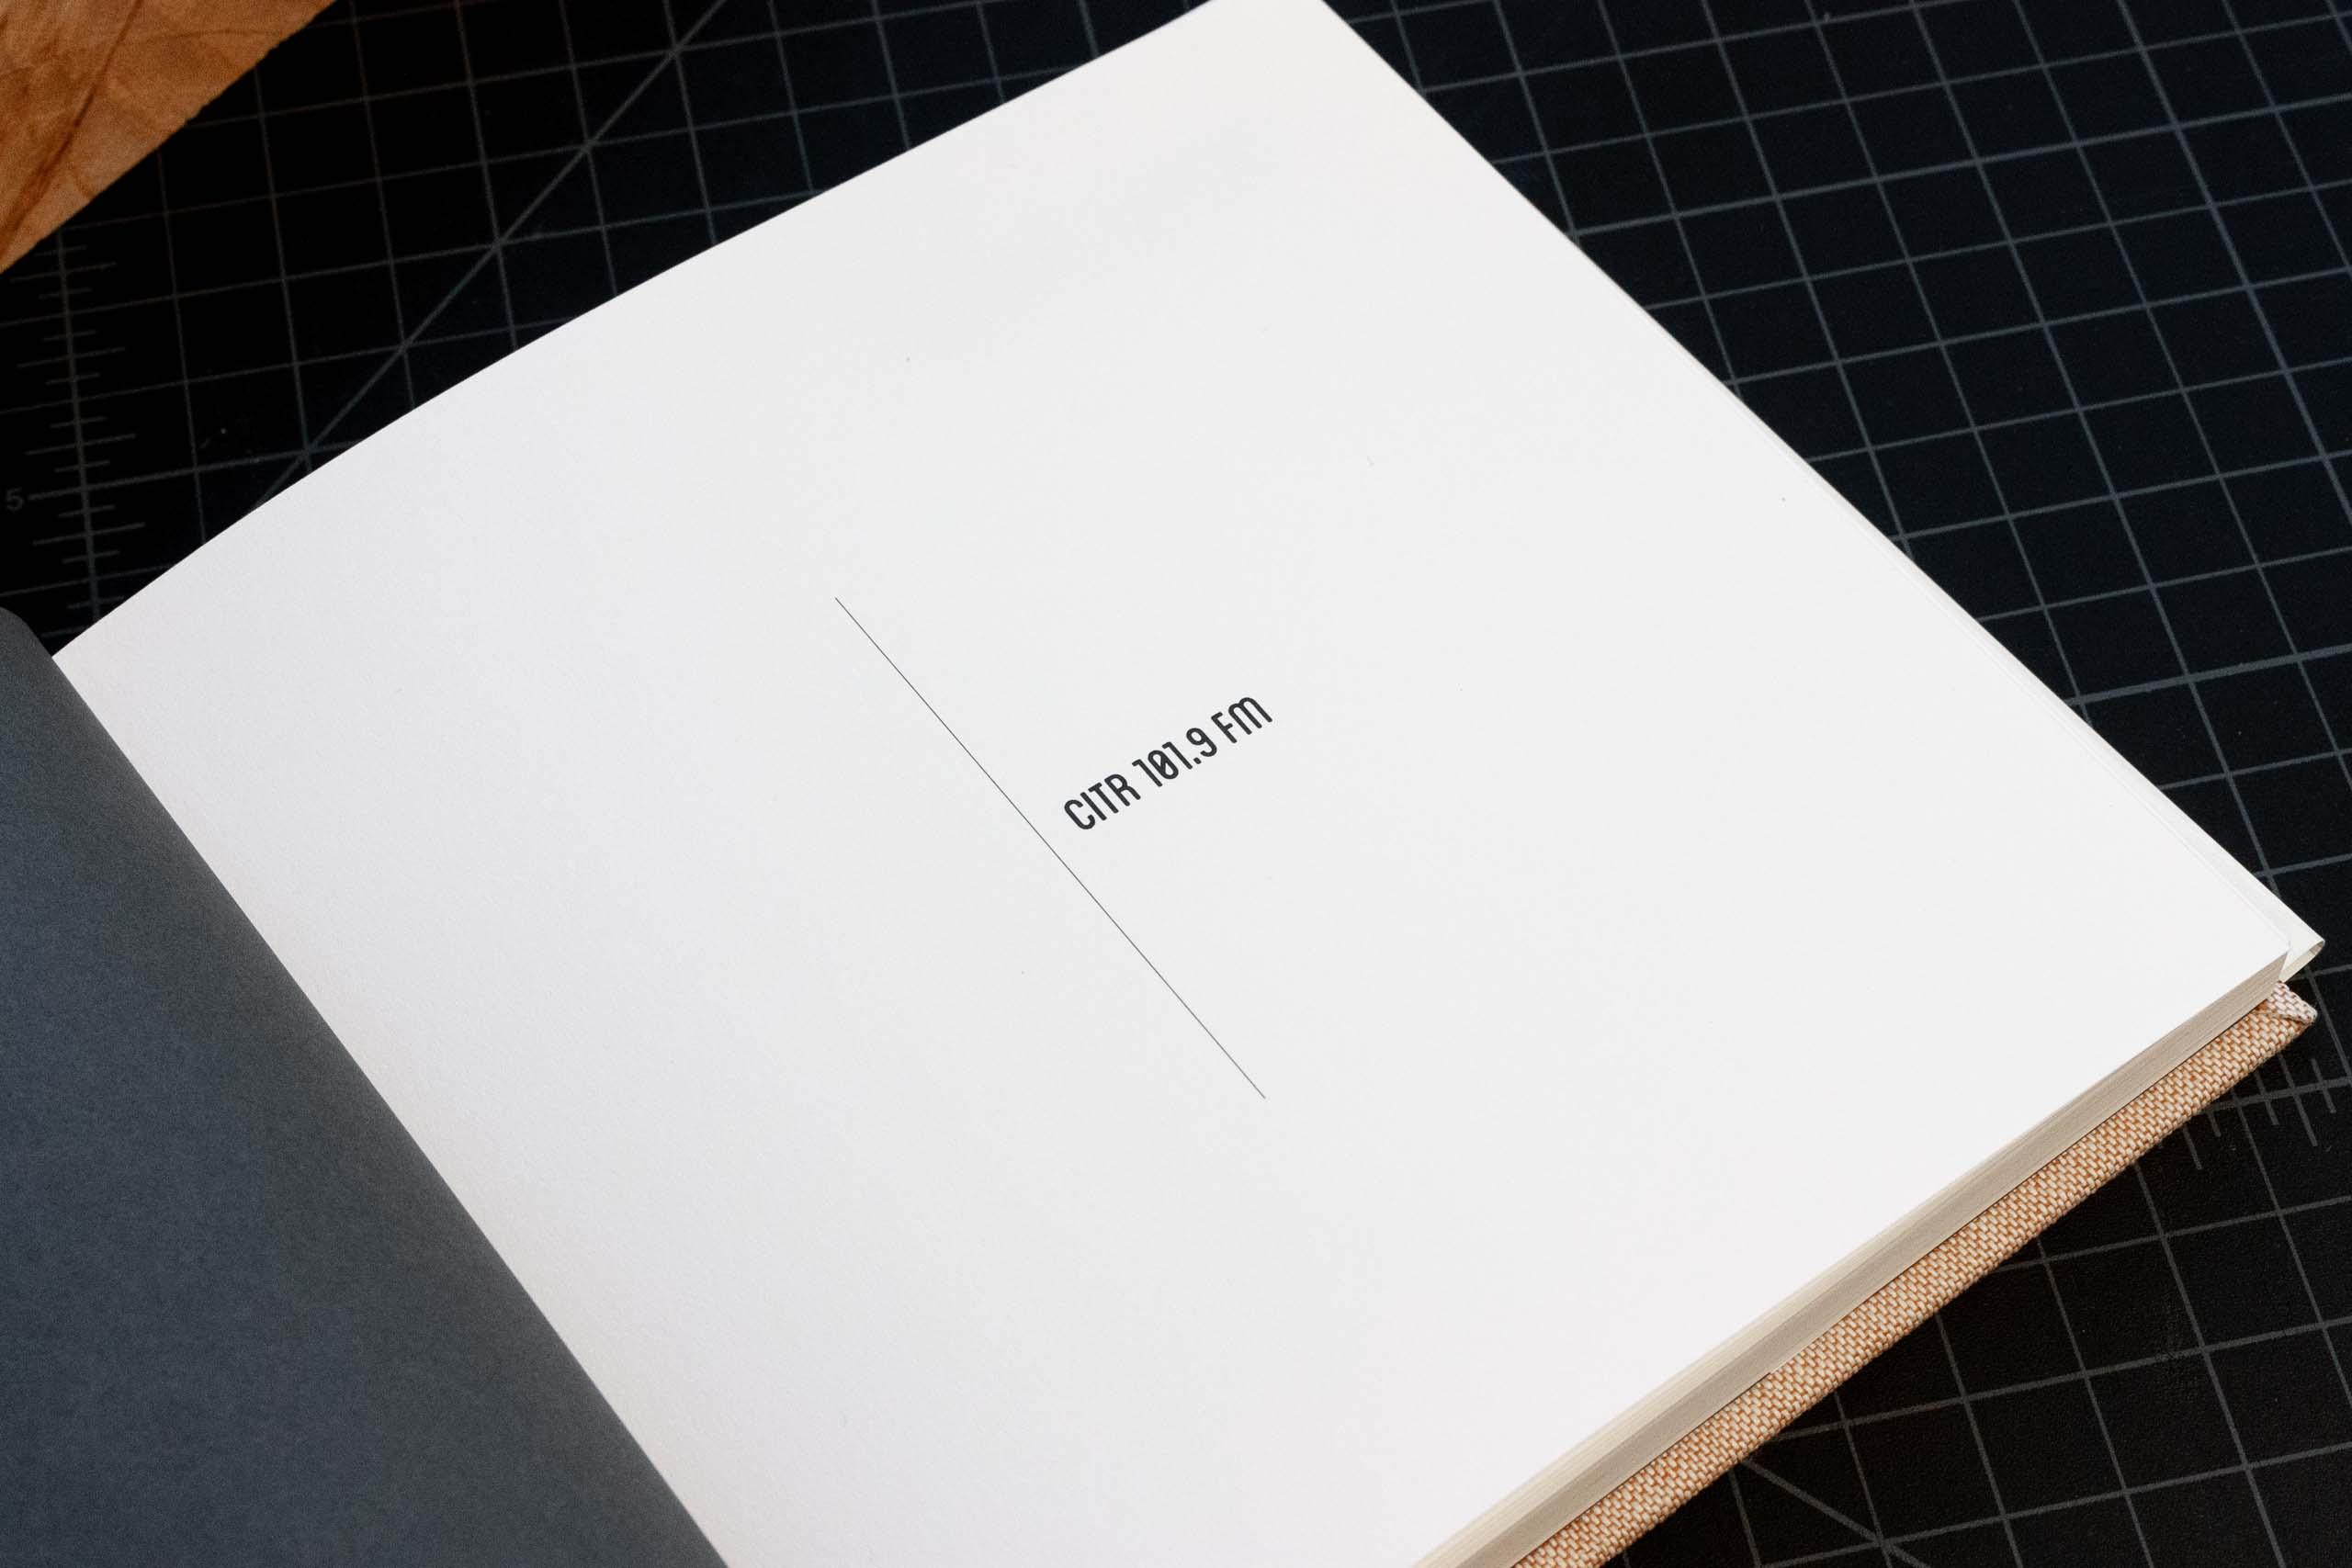 CiTR Radio inside flap with radio name— by Yagnyuk.